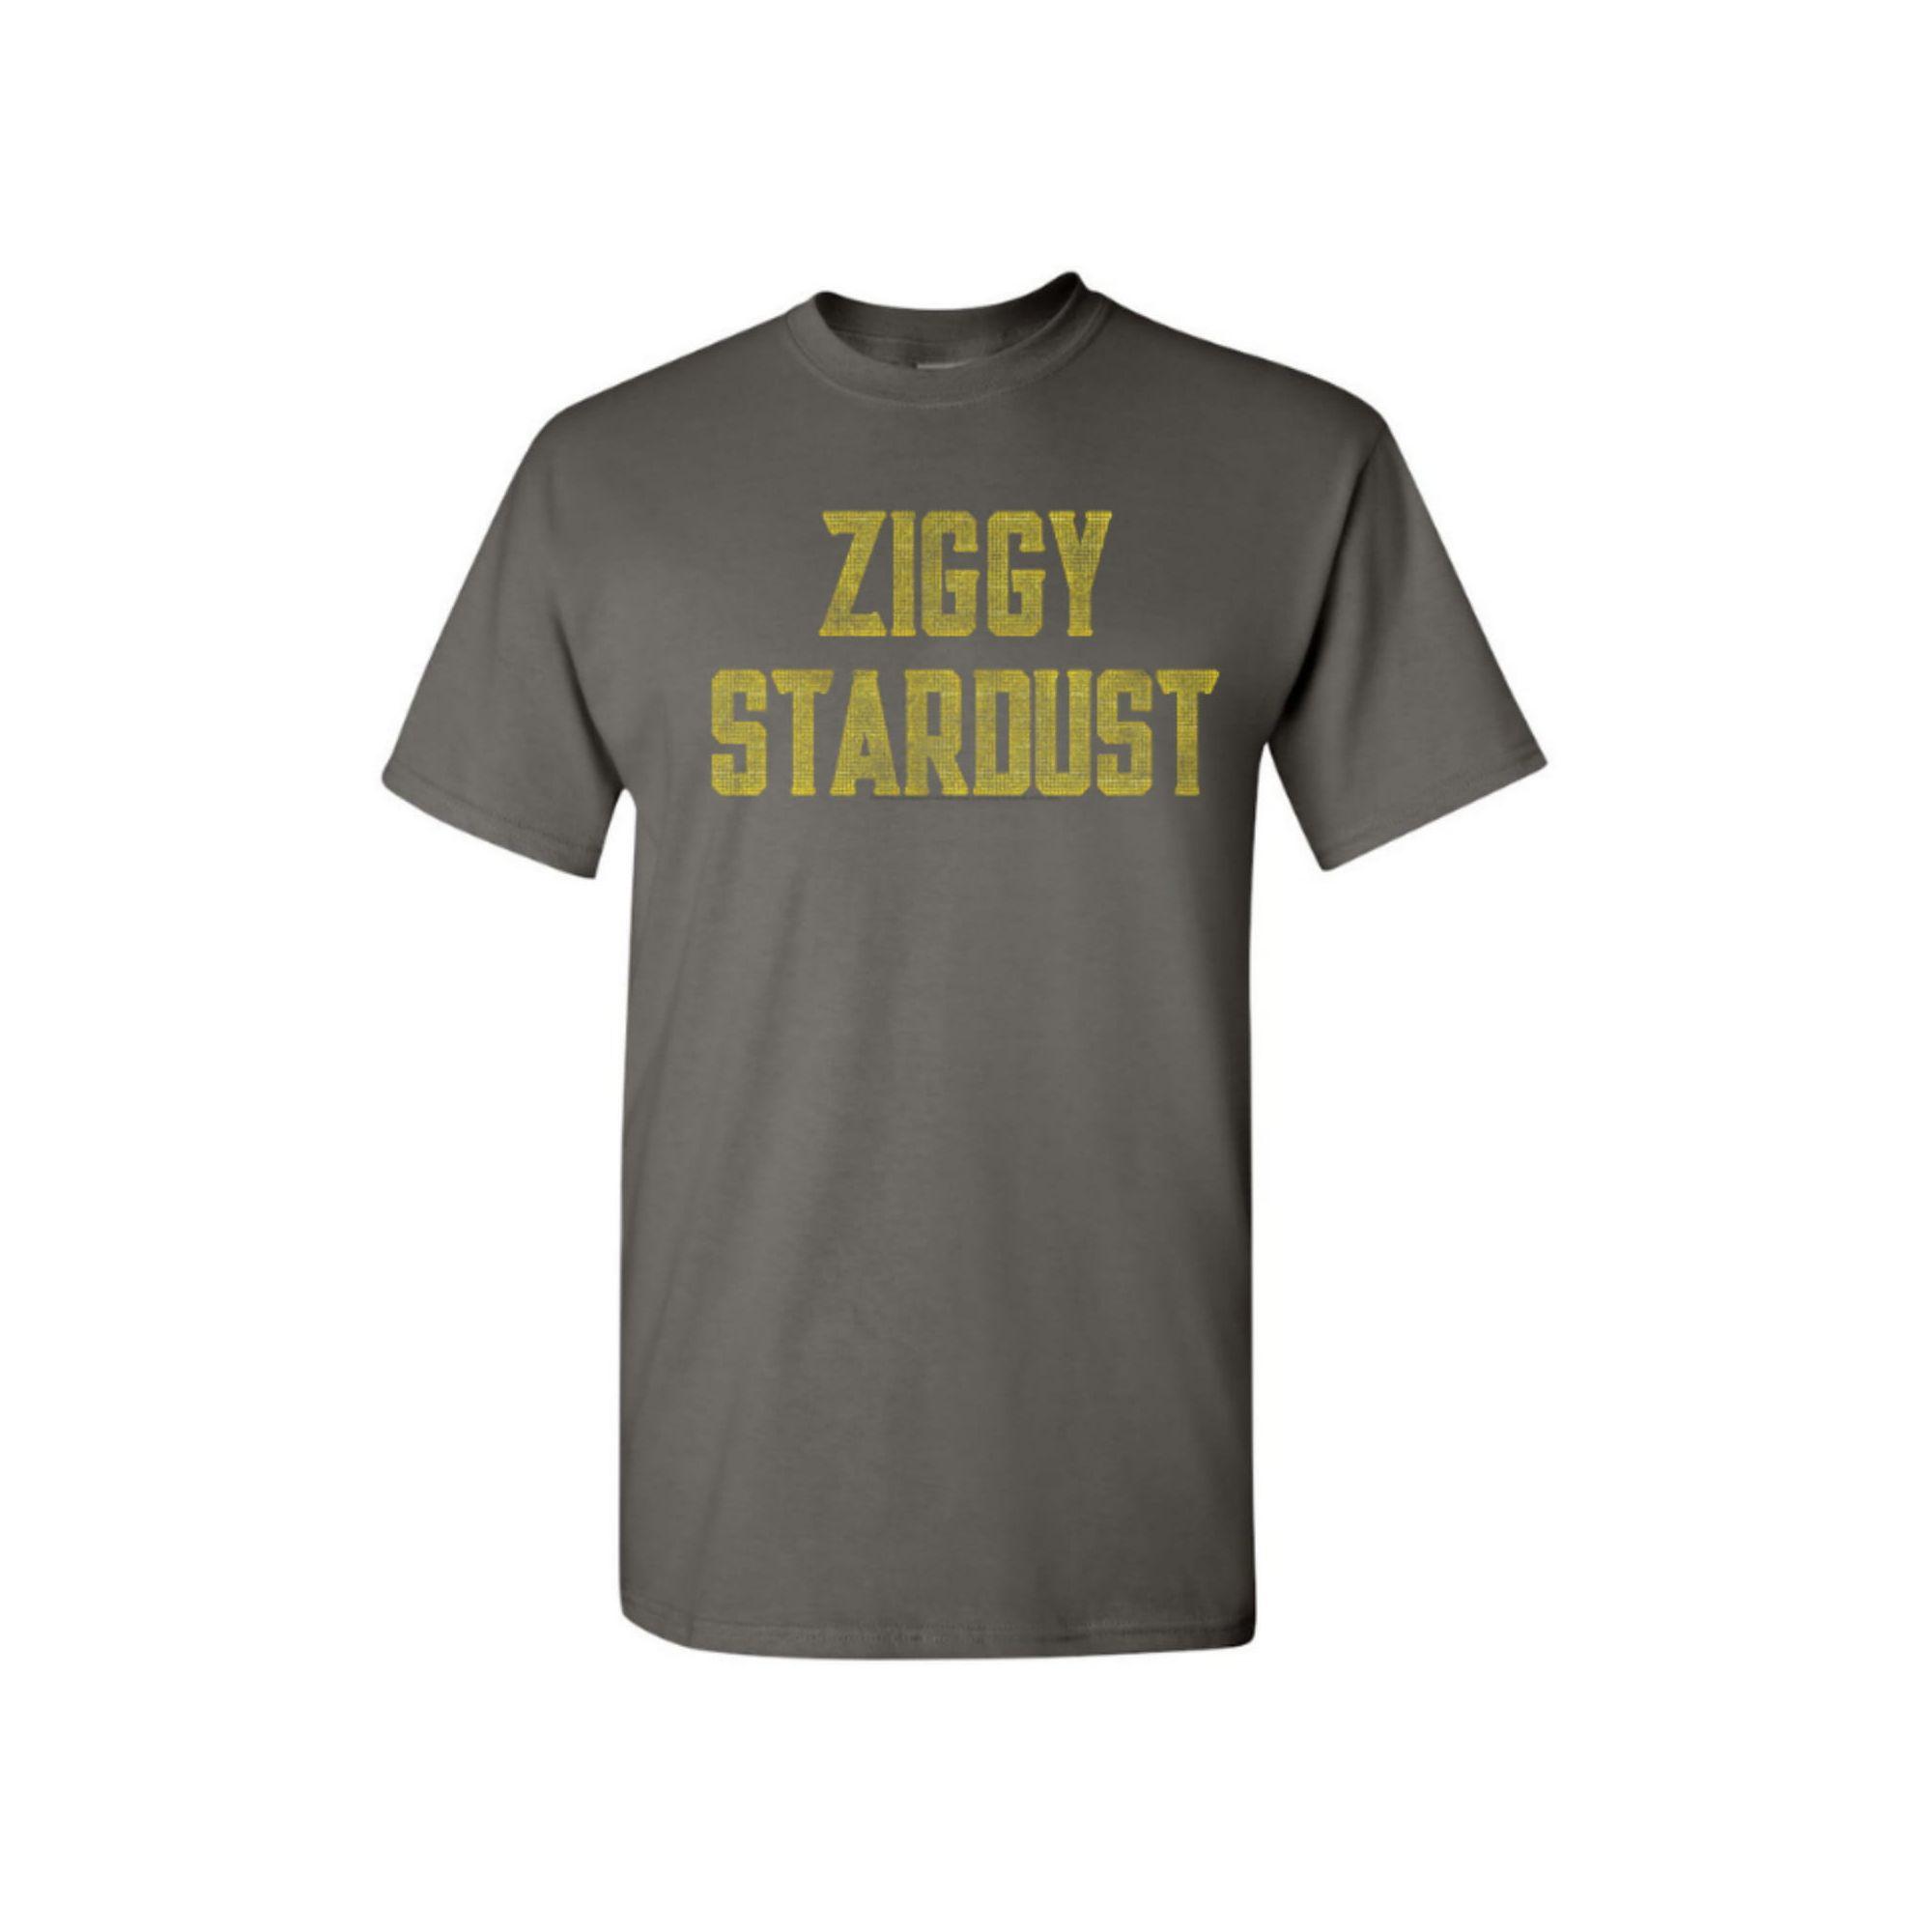 Ziggy Stardust T-Shirt